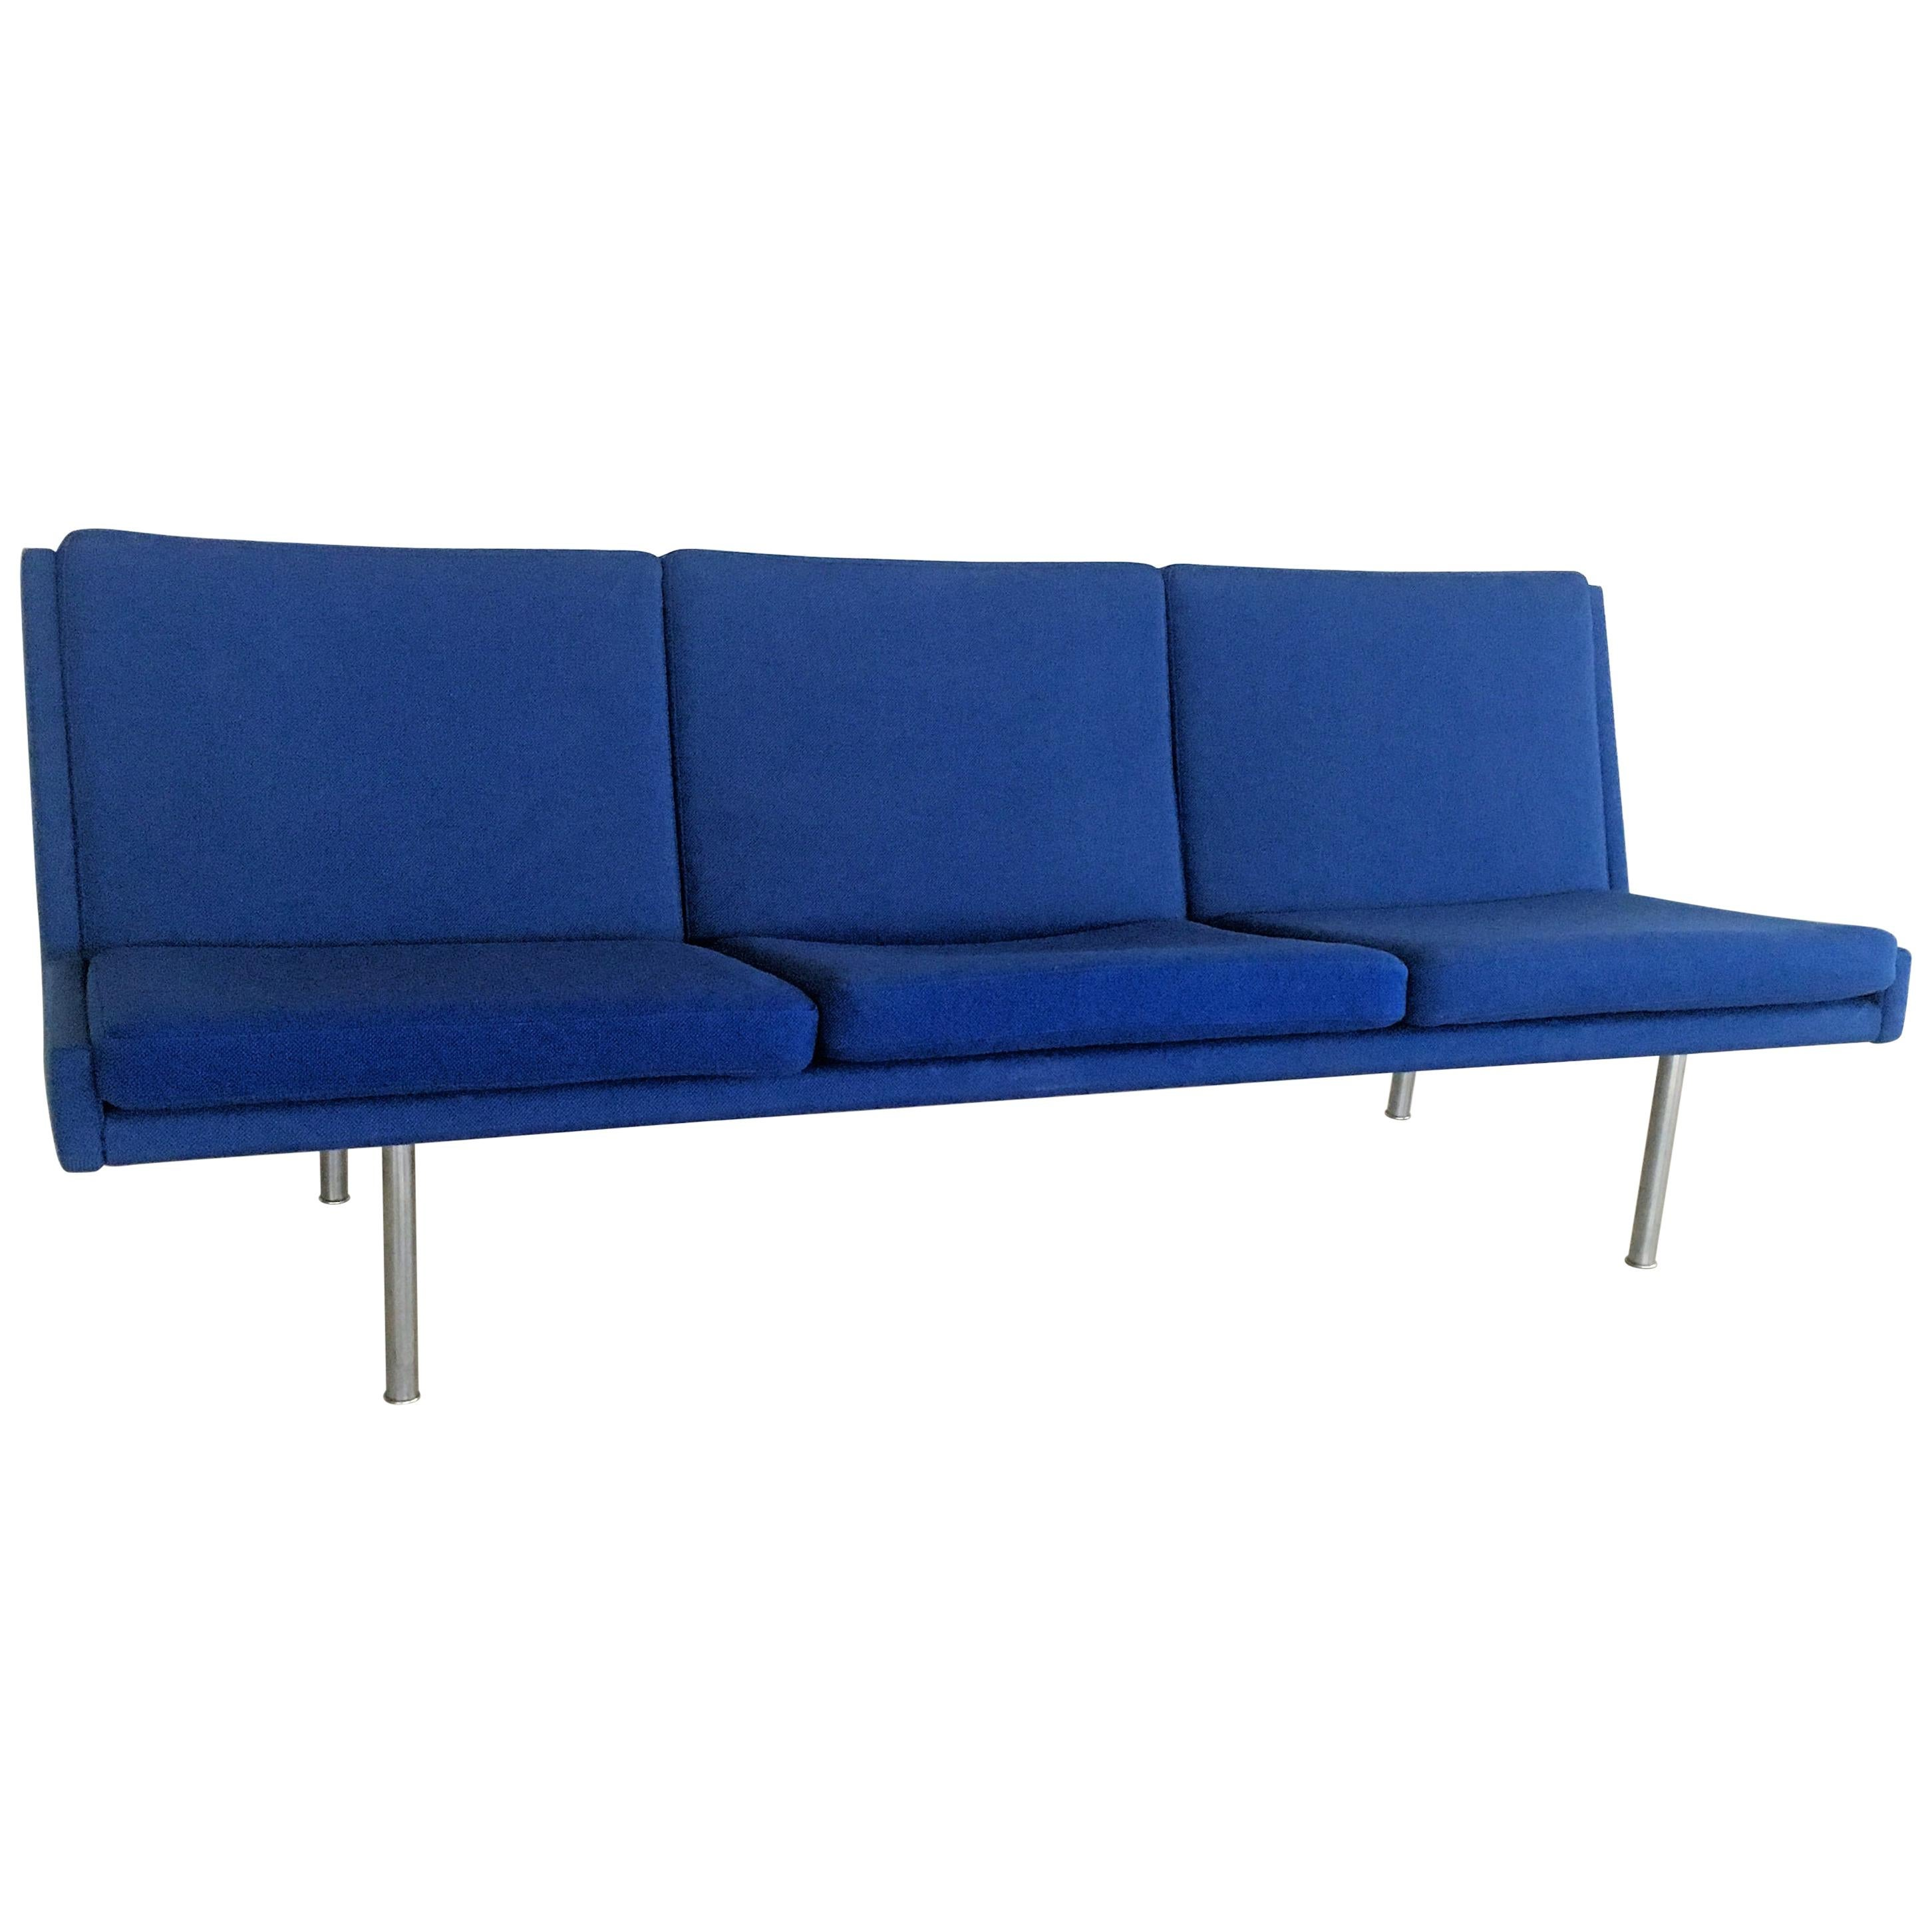 1960s Hans J. Wegner Airport Sofa in Original Blue Fabric by A.P. Stolen